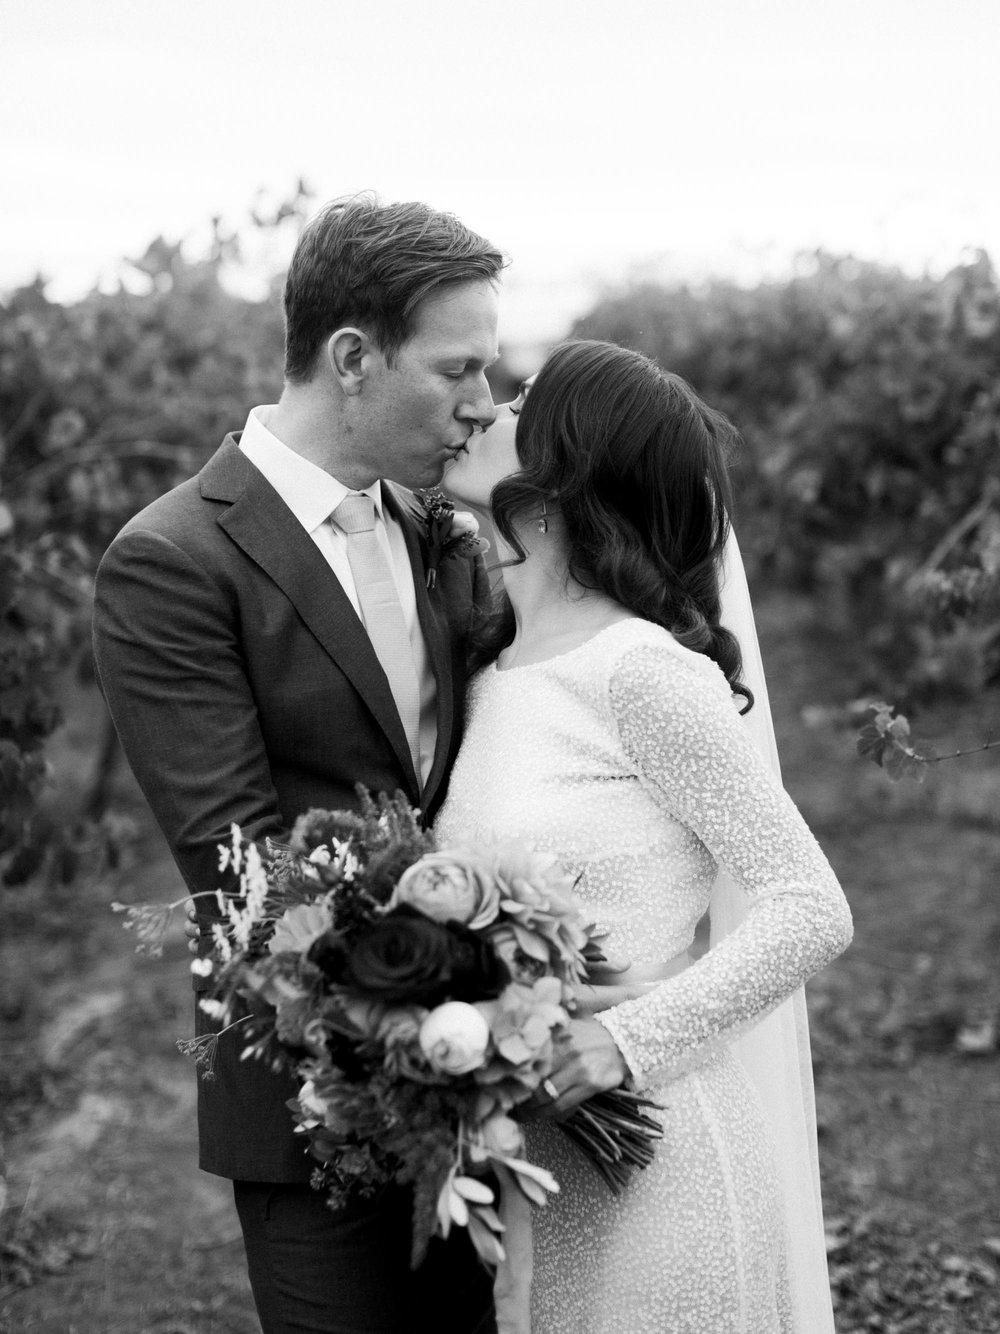 Hentley-Farm-wedding-photography-046.jpg